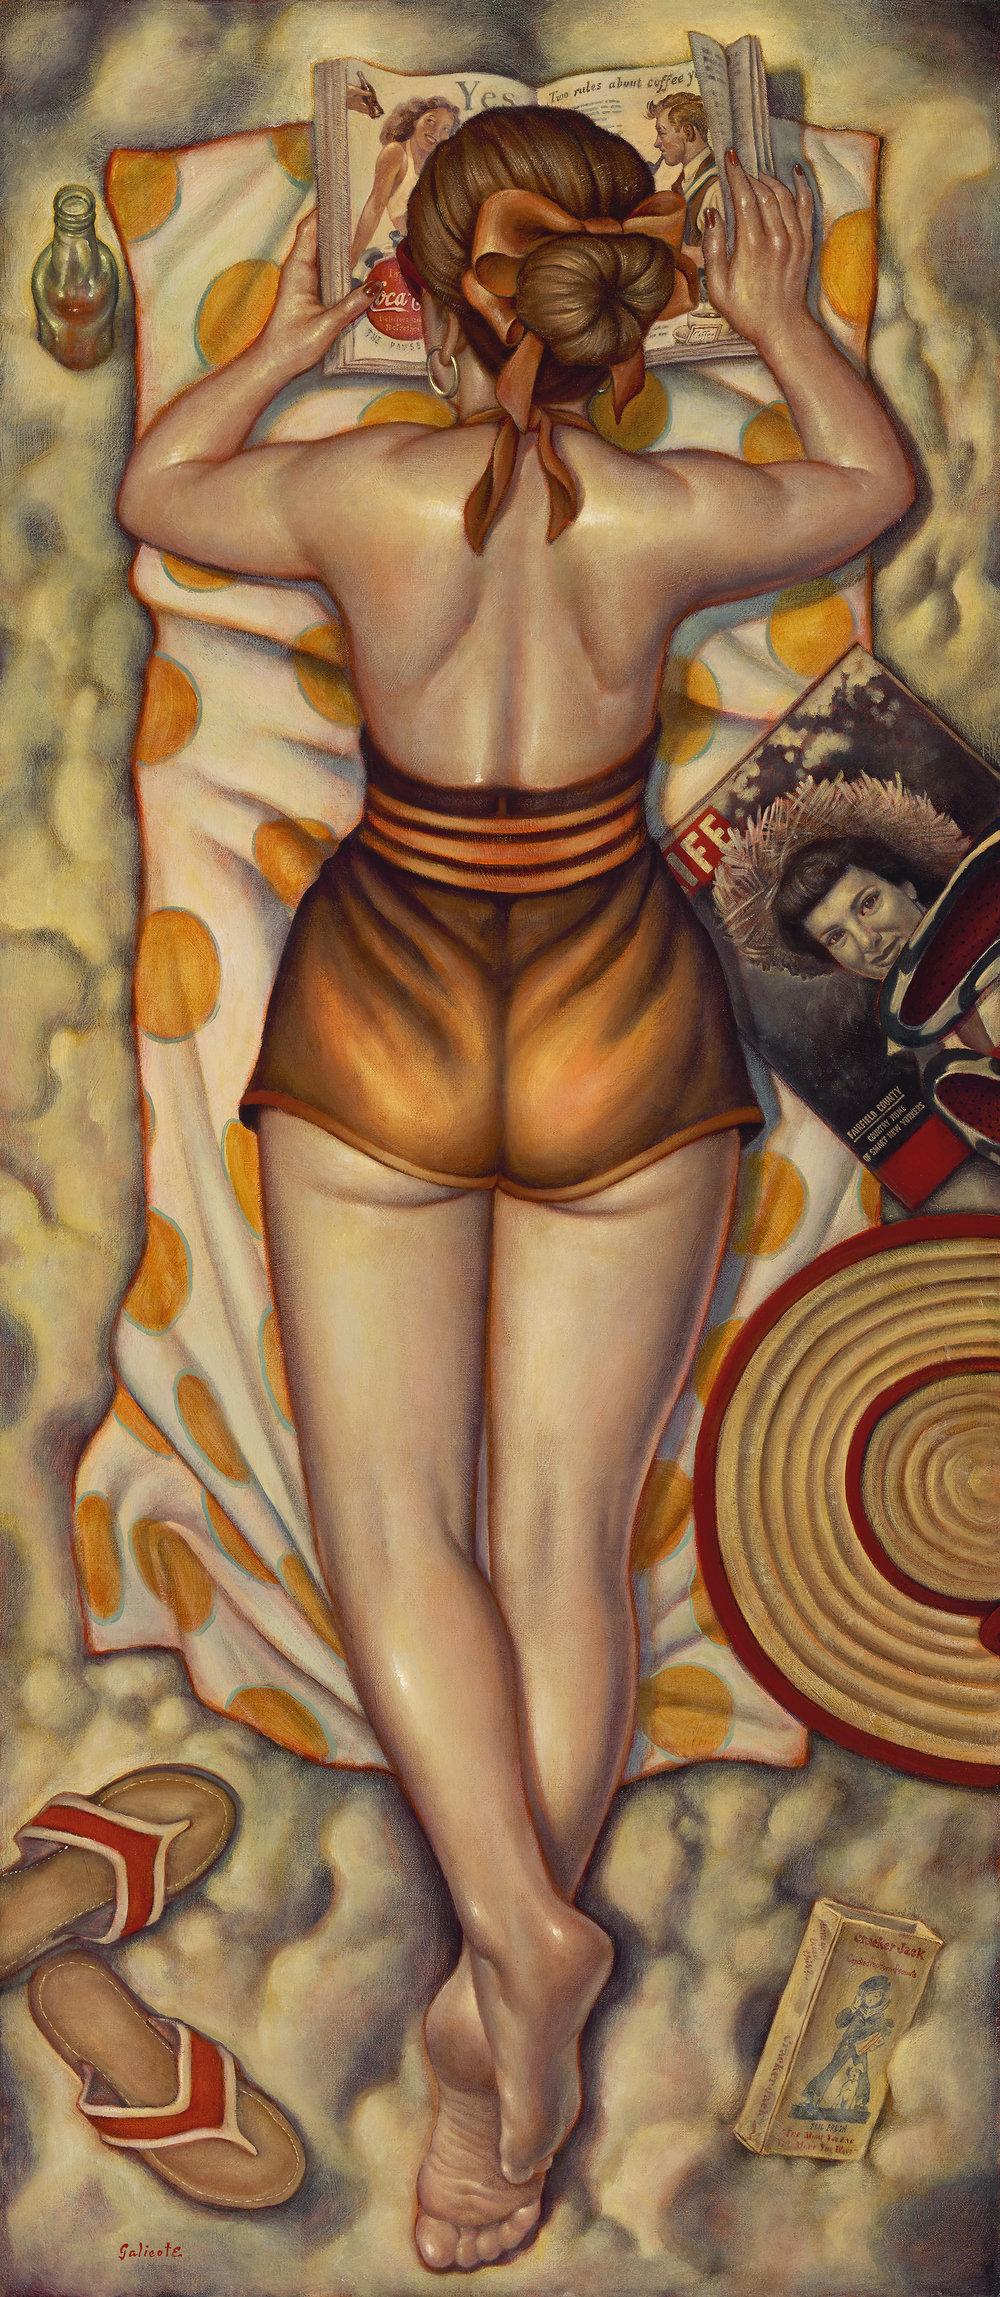 картины Дэнни Галиоте (14).jpg